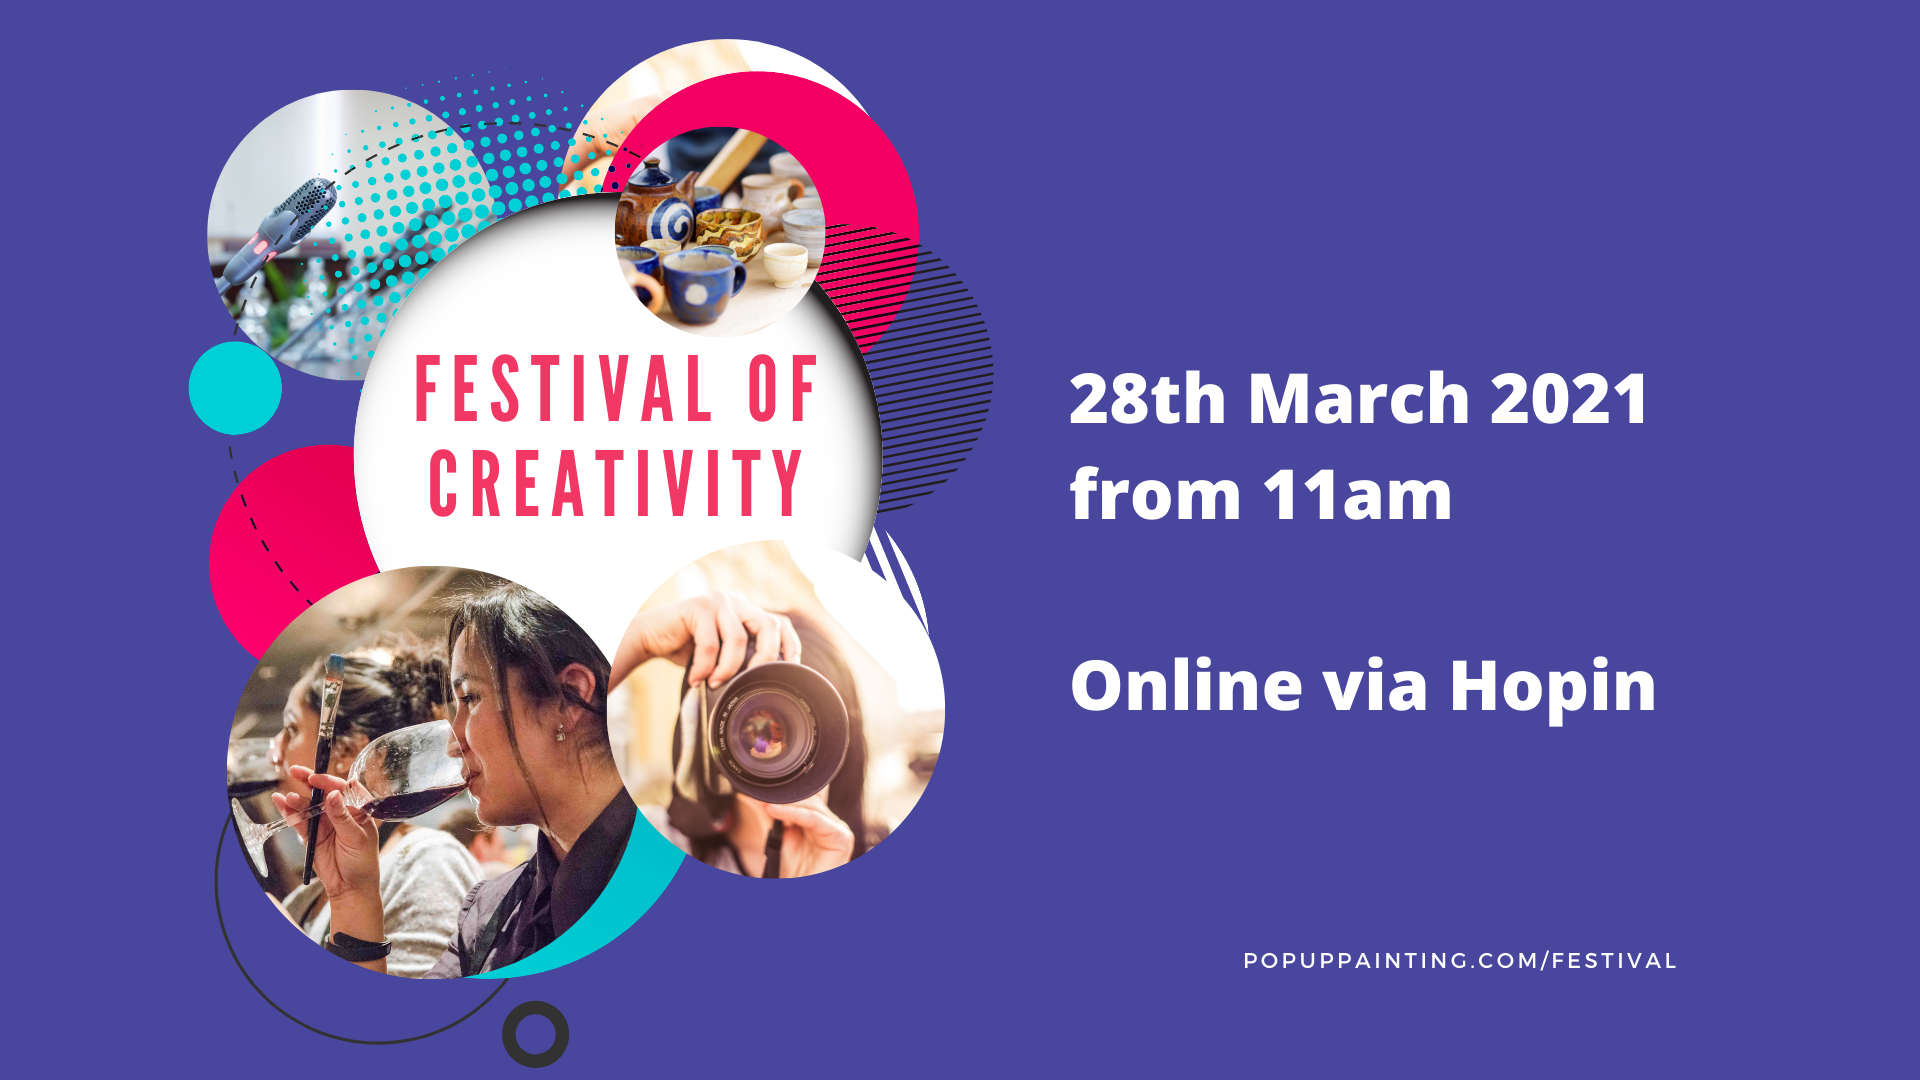 Festival of Creativity 28 March